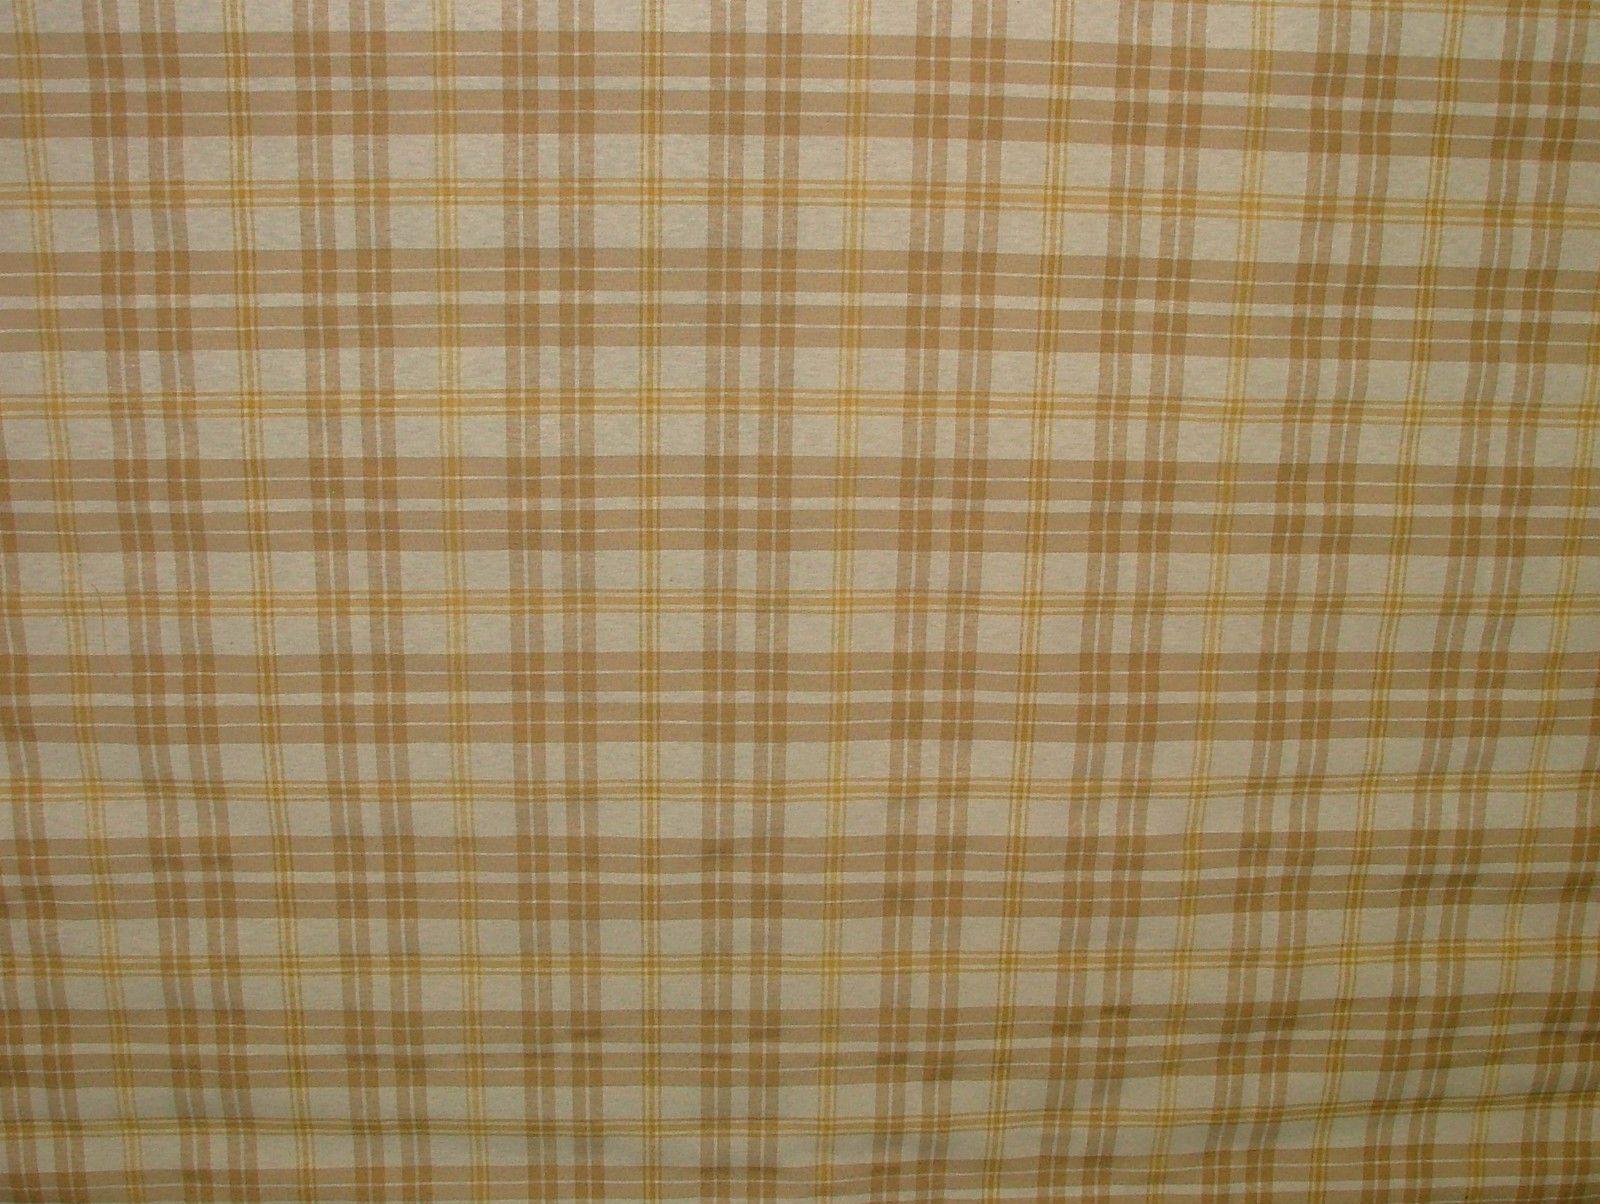 Prestigious Textiles Beige Gold Cream Check Curtain Soft